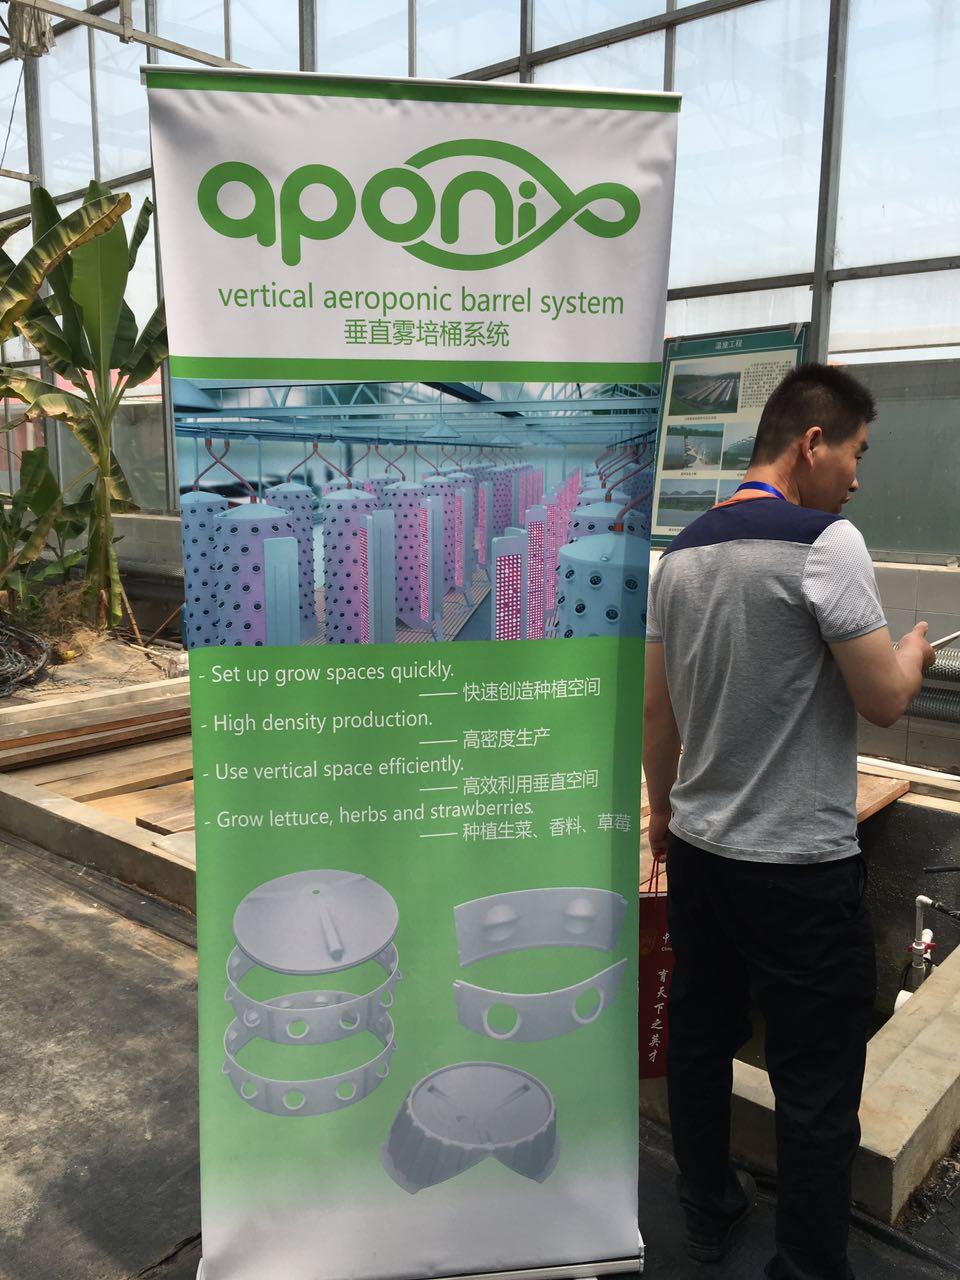 Aponix Vertical Barrels shown in Tongzhou Park, Beijing